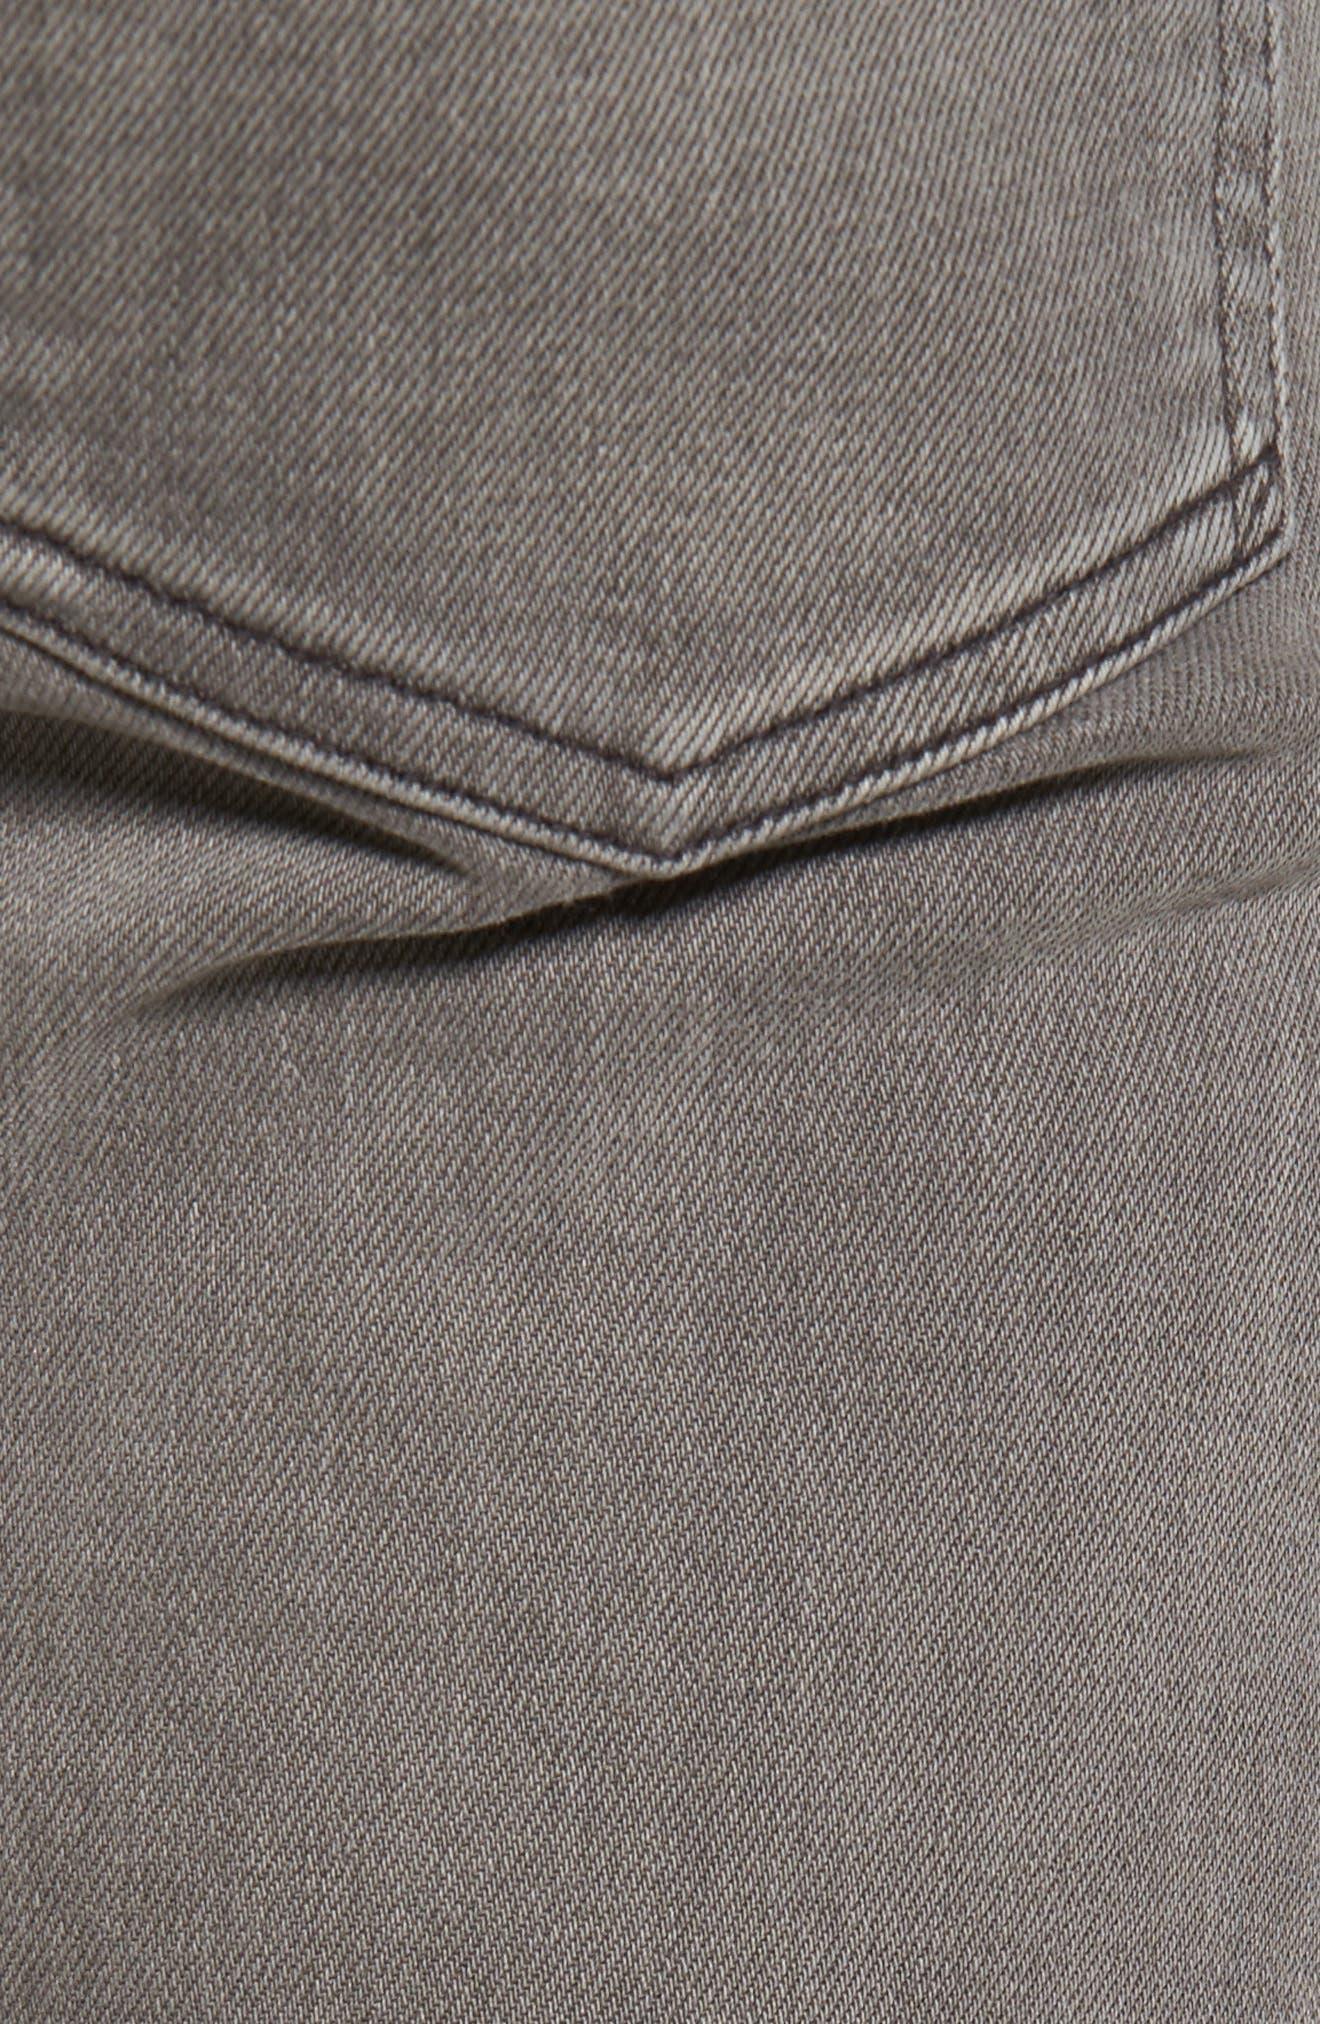 Bowery Slim Fit Jeans,                             Alternate thumbnail 5, color,                             Leon